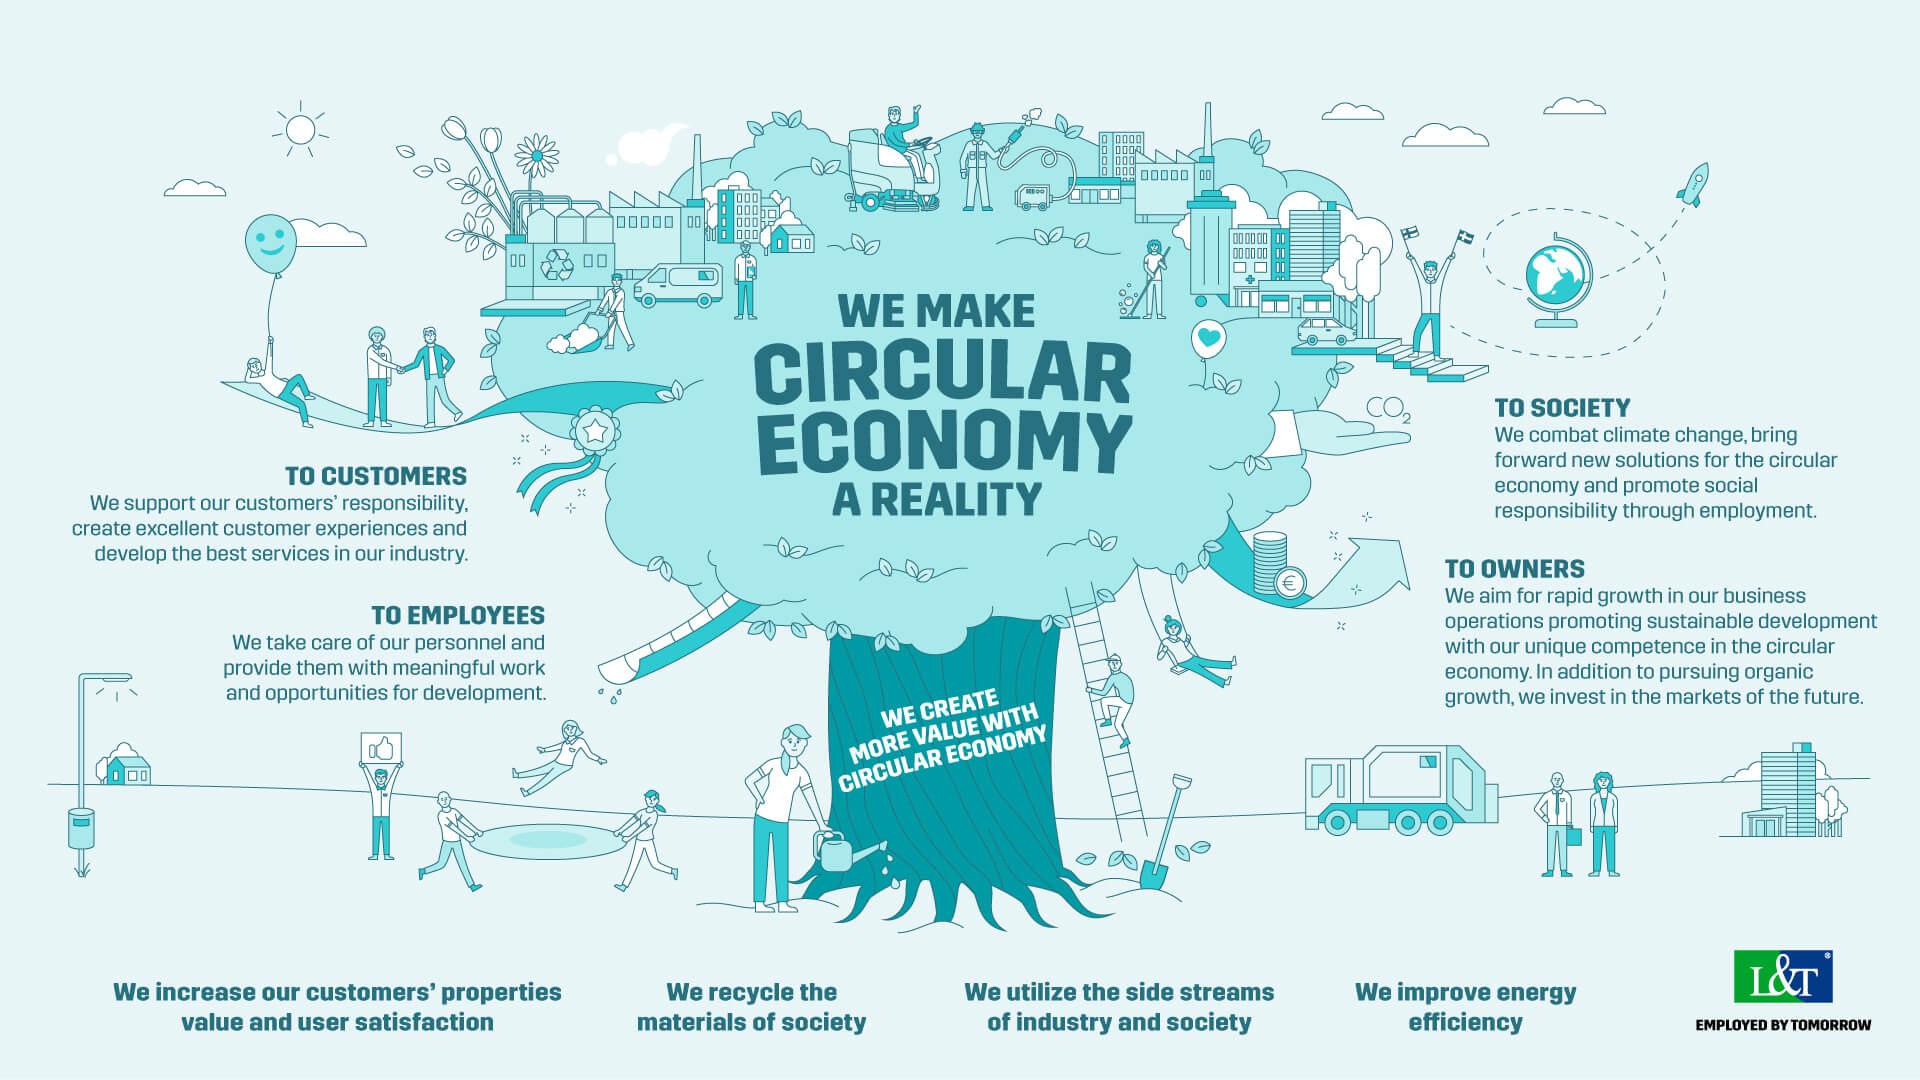 Lassila & Tikanoja Strategy - We make circular economy a reality